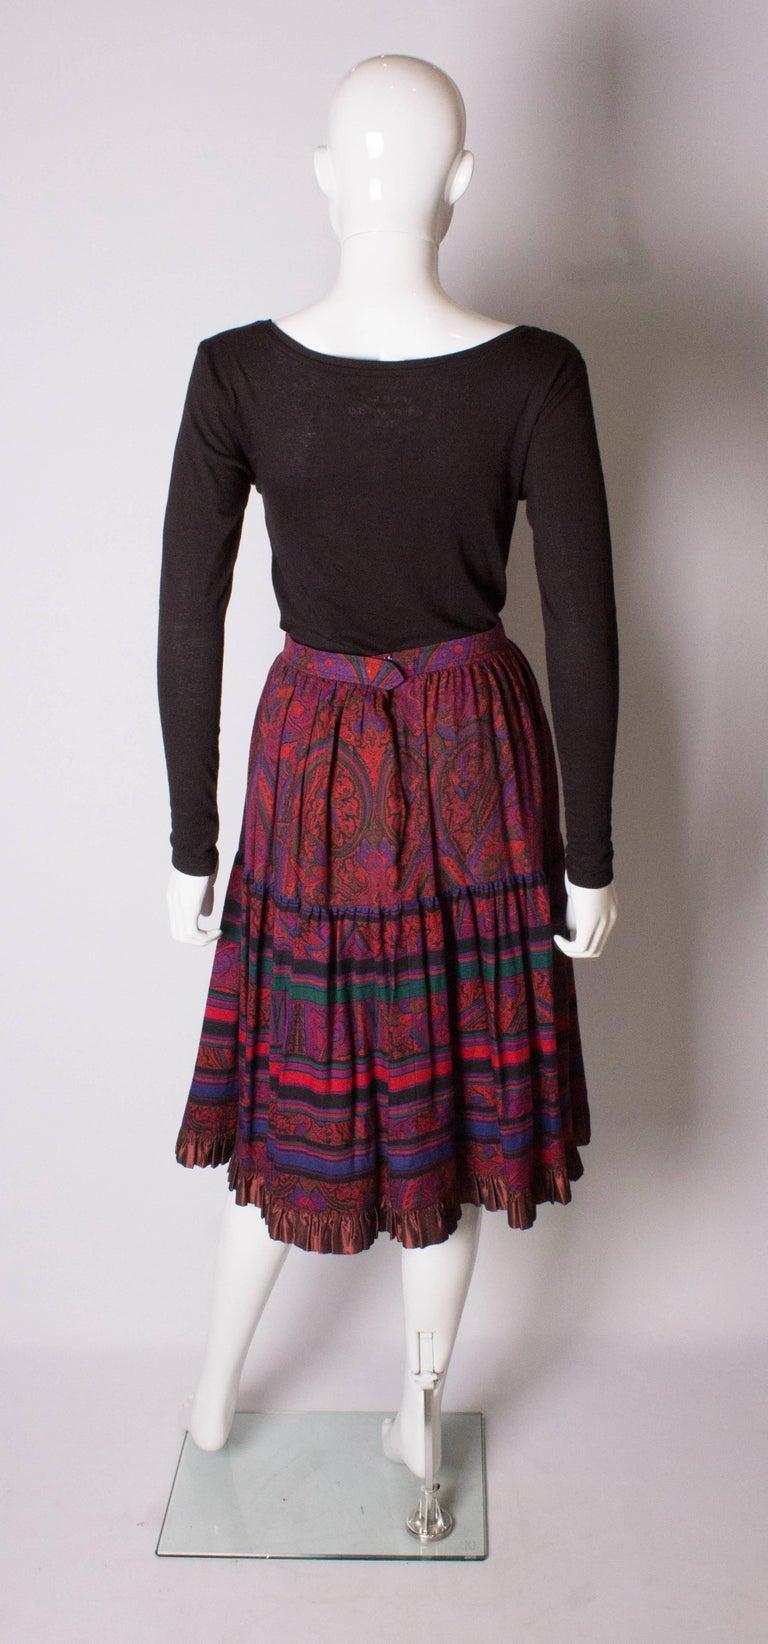 Yves saint Laurent Rive Gauche  Paisley Print  Skirt For Sale 2